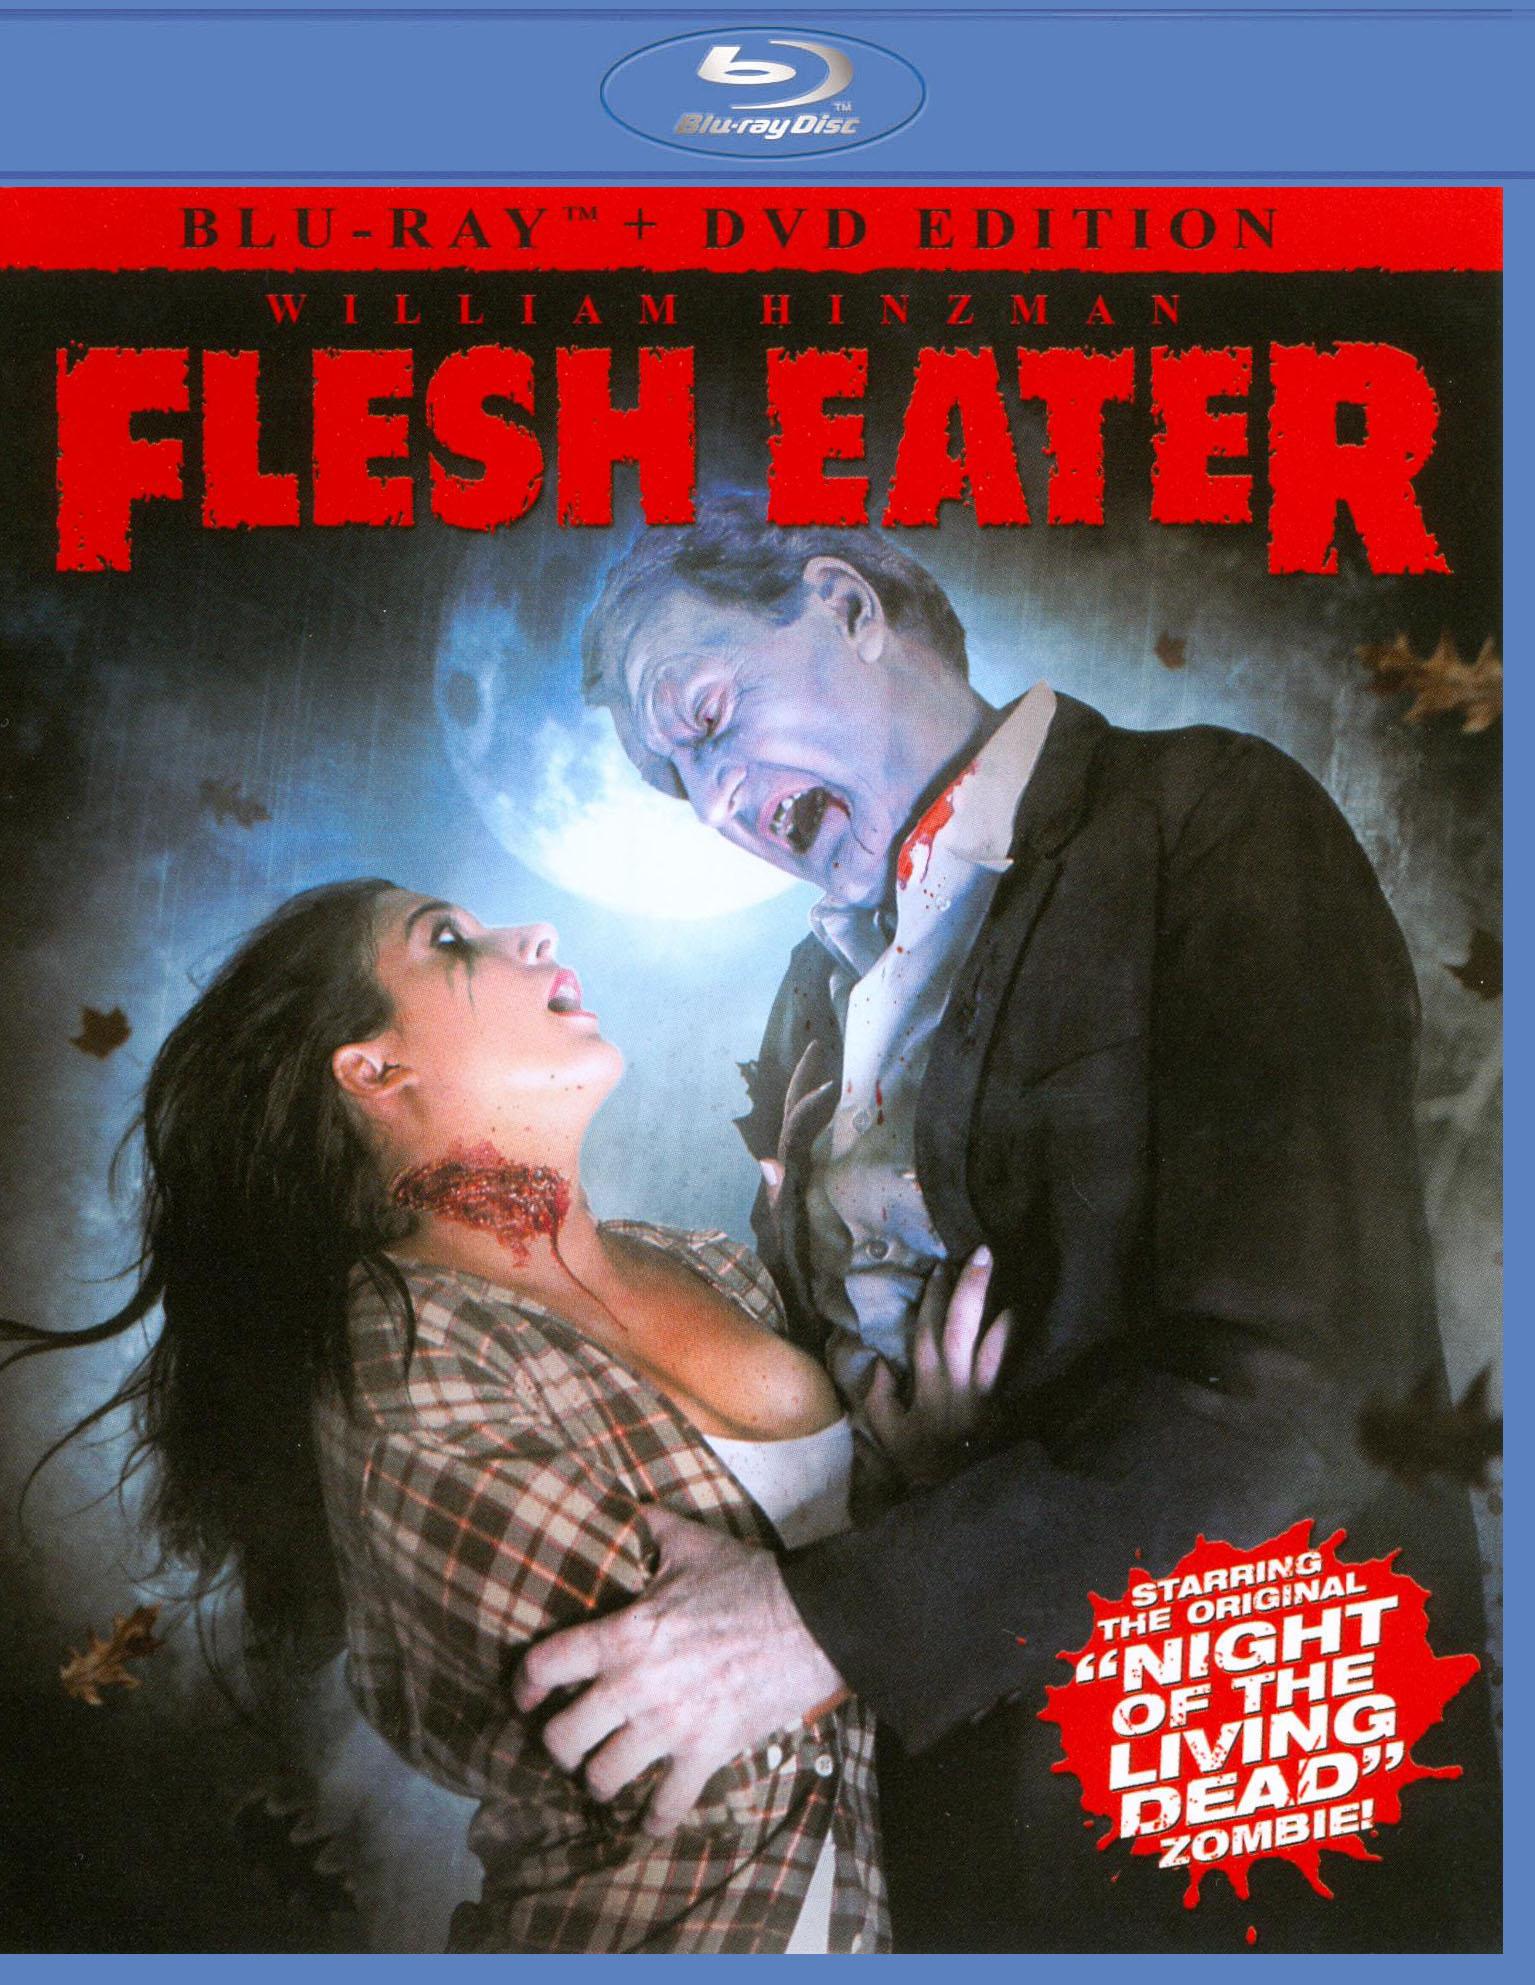 Flesheater